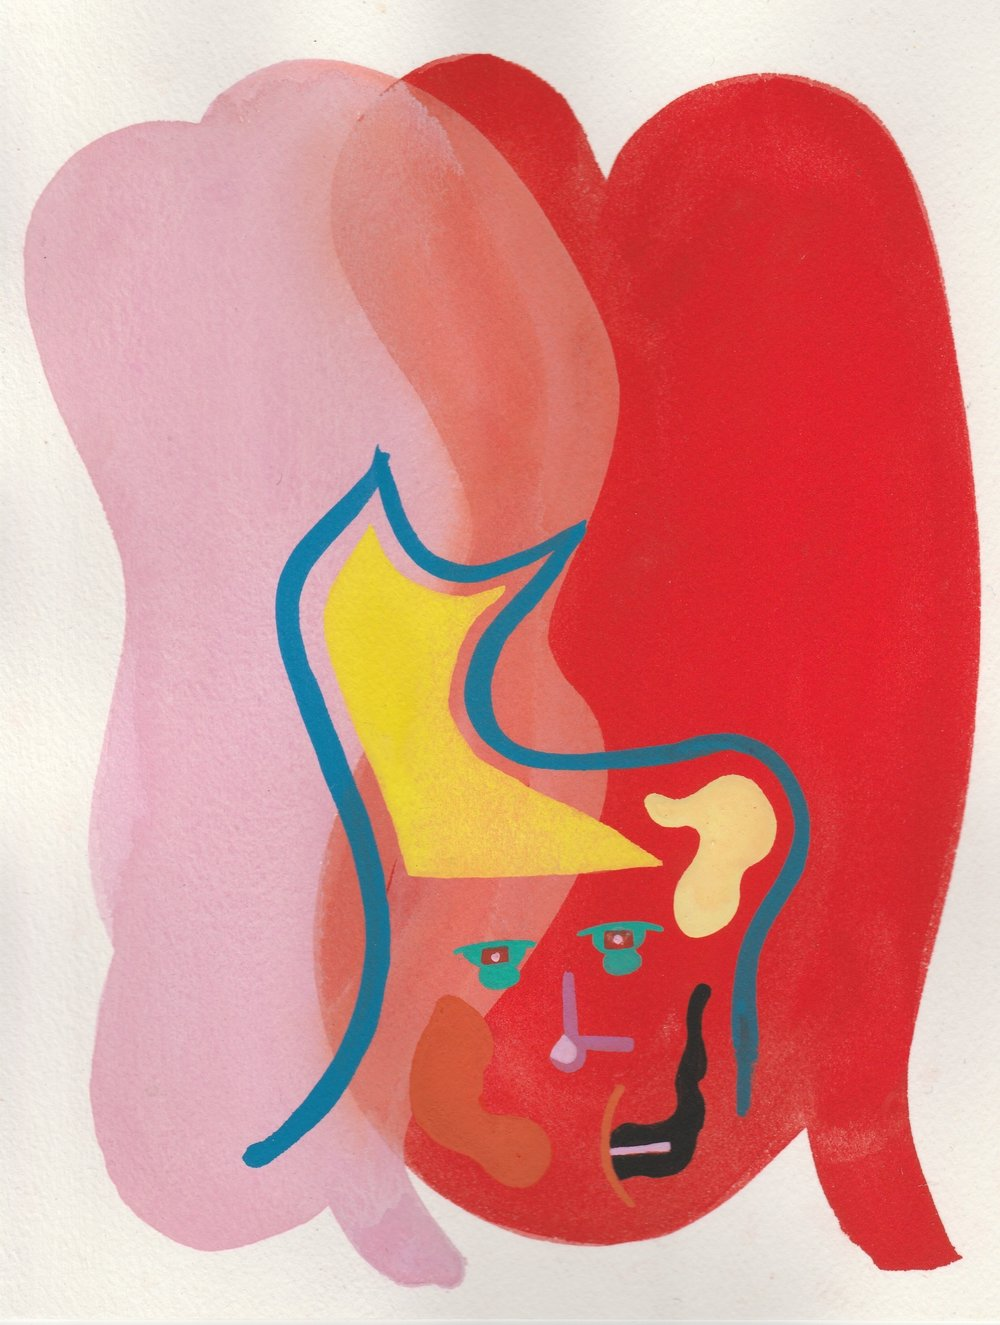 FaceTime #6   2017  Watercolor, Guache  8.5 x 11 inches